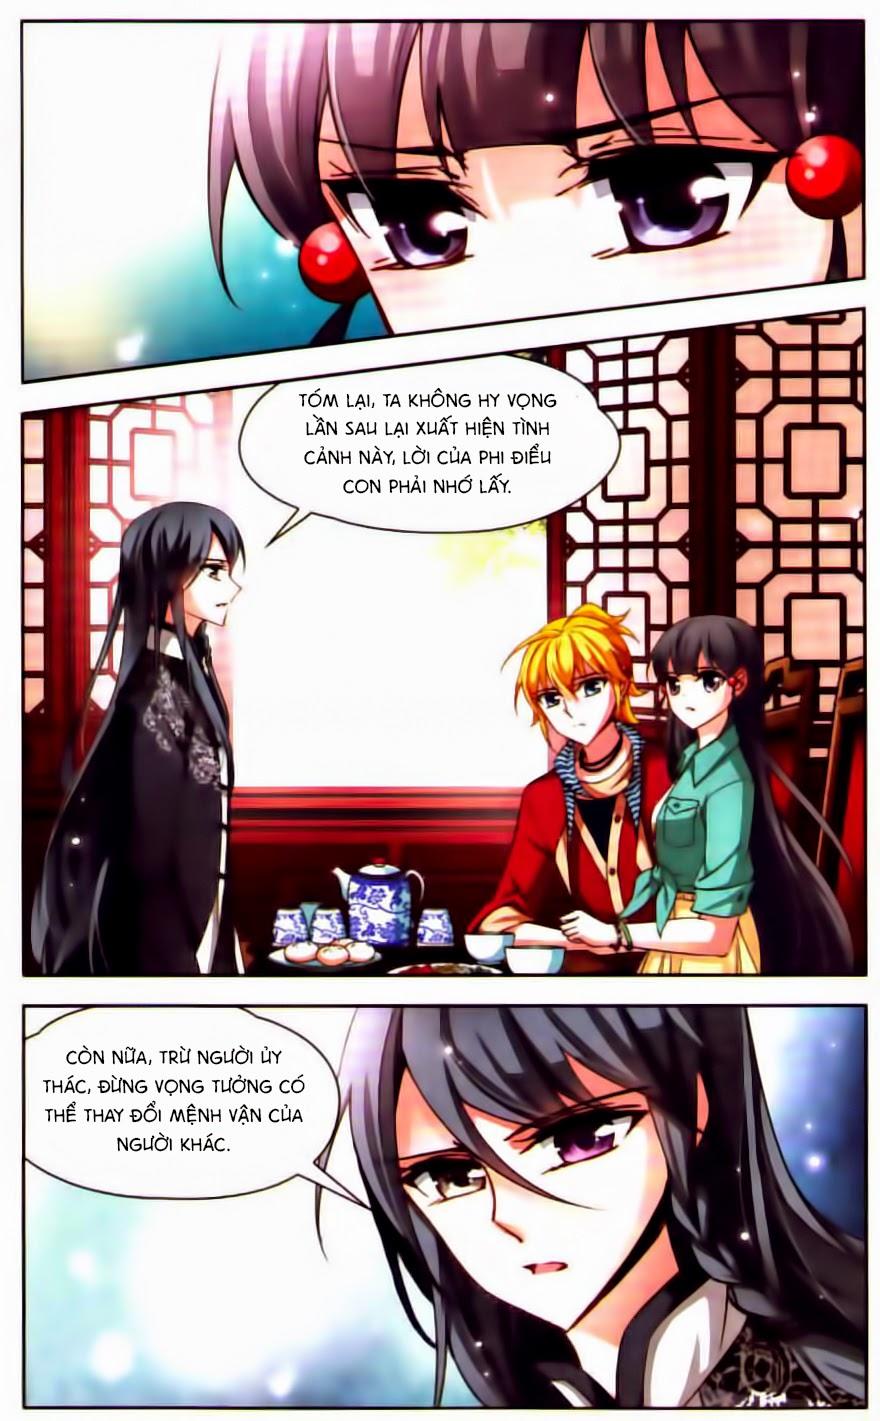 a3manga.com tam trao tien the chi lu chap 47